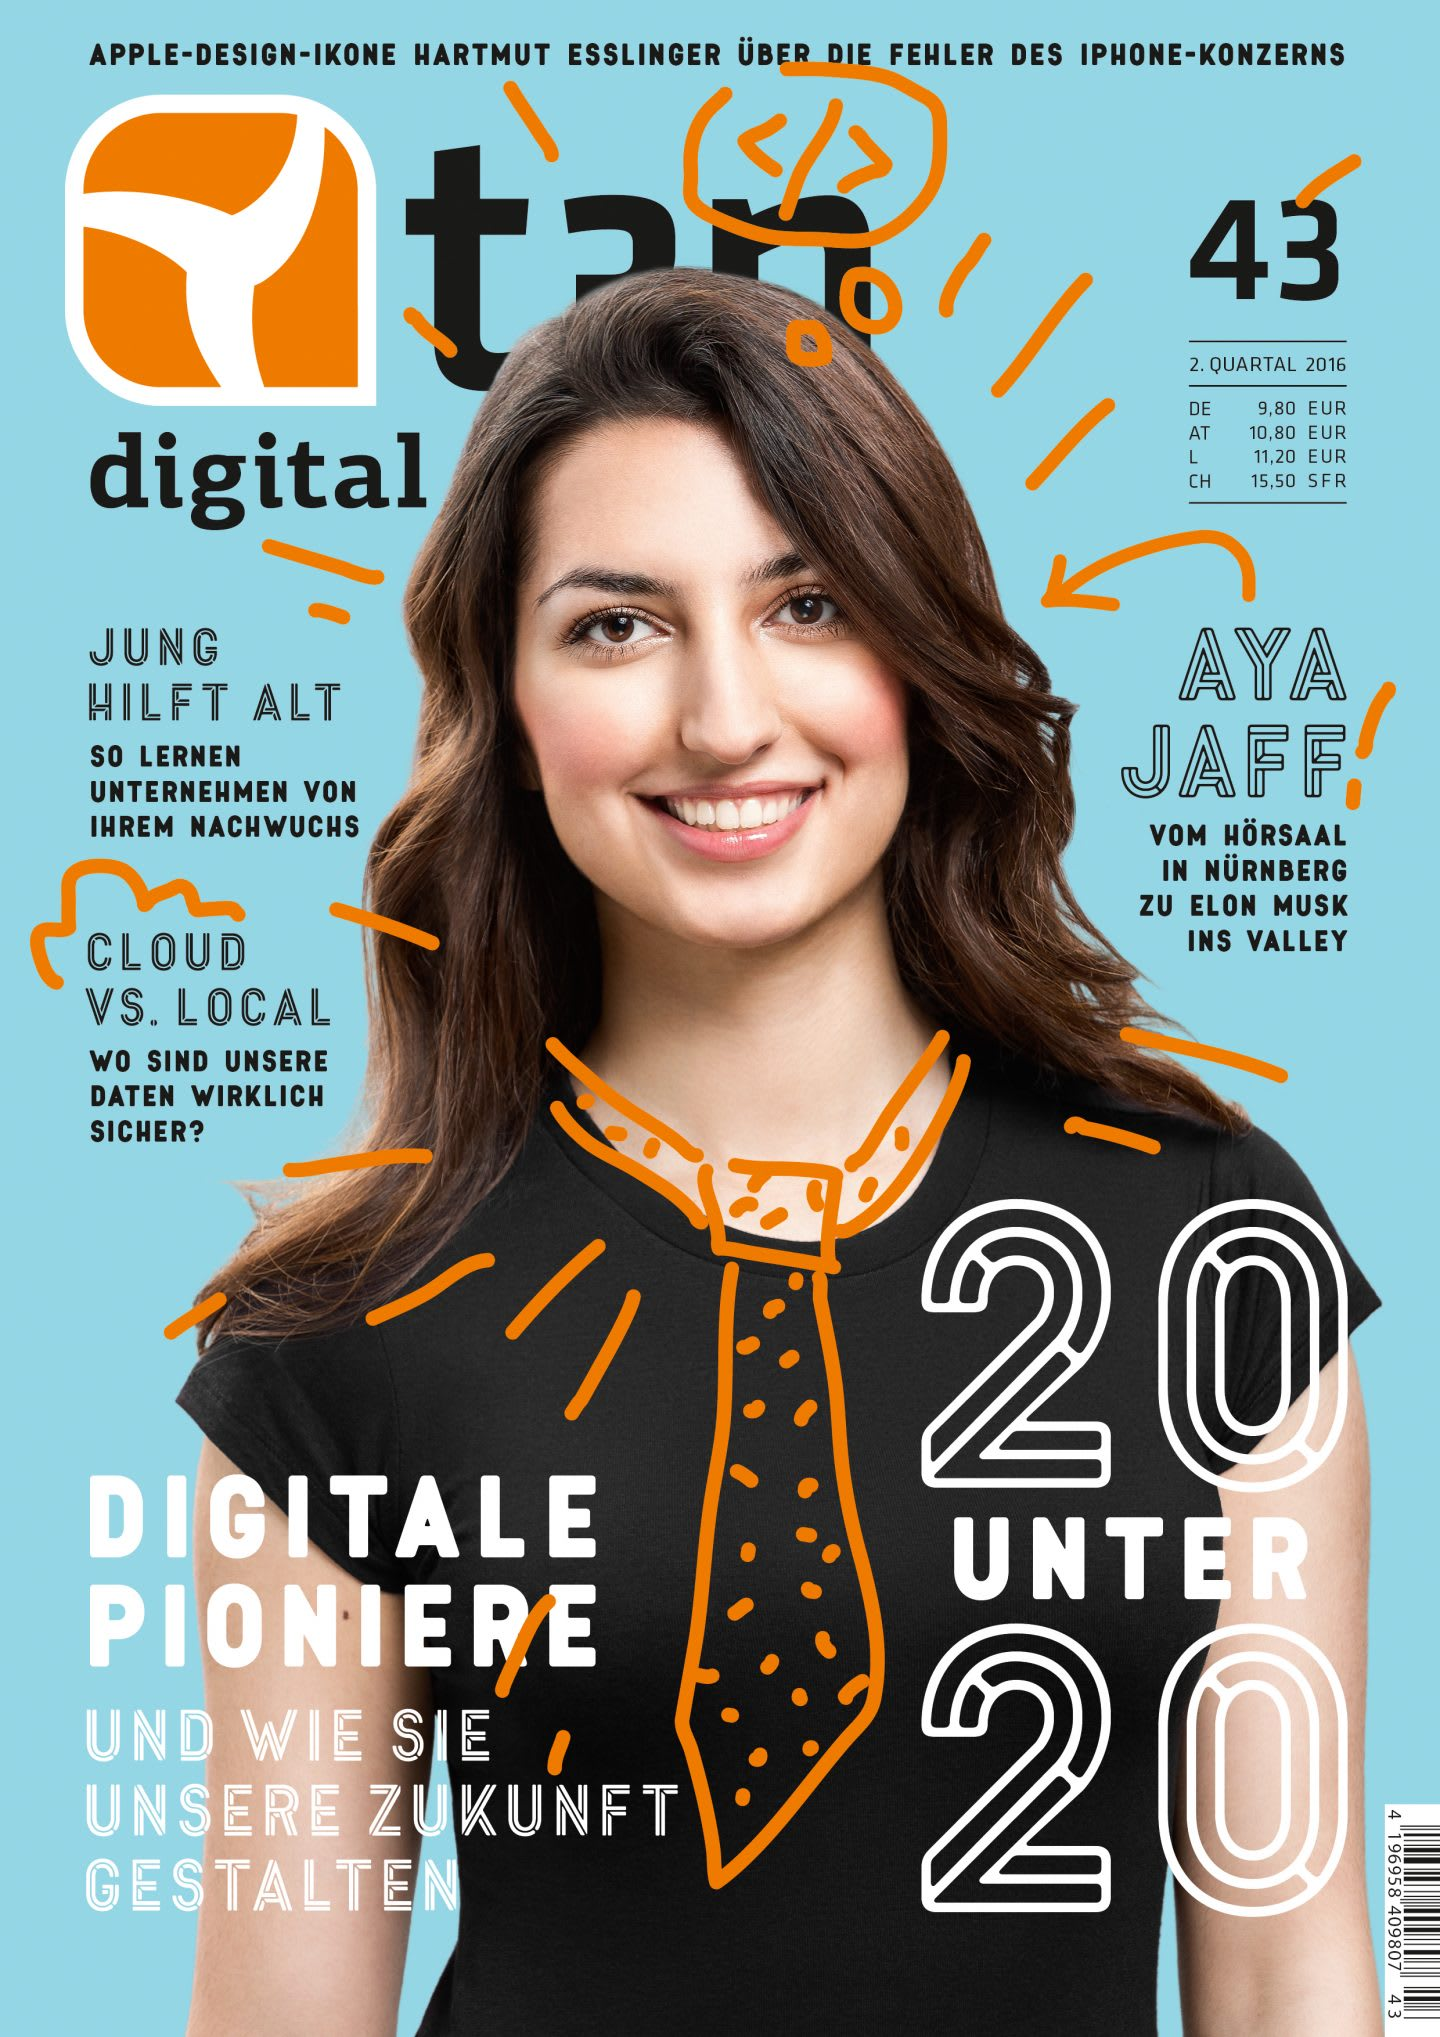 Aya_cover_tan magazin